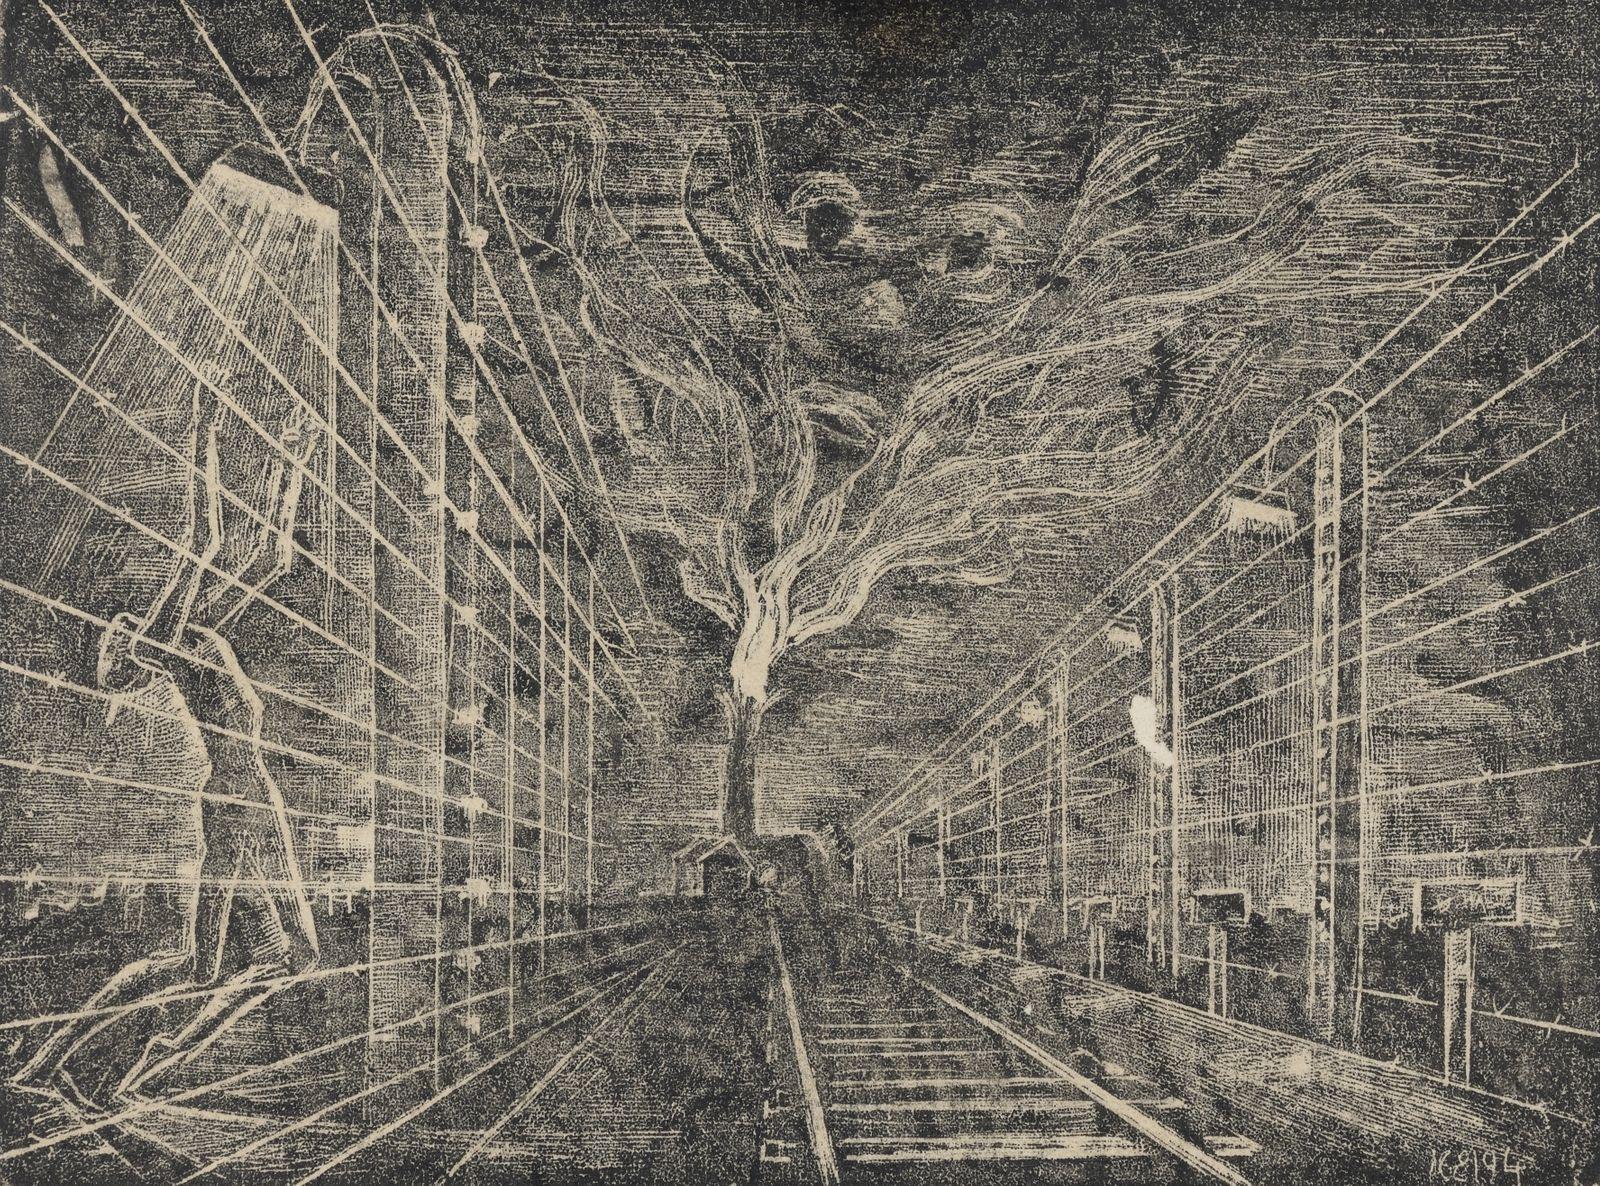 Yehuda Bacon - Recollections from Auschwitz - Crematorium No. 3 & 4, 1945